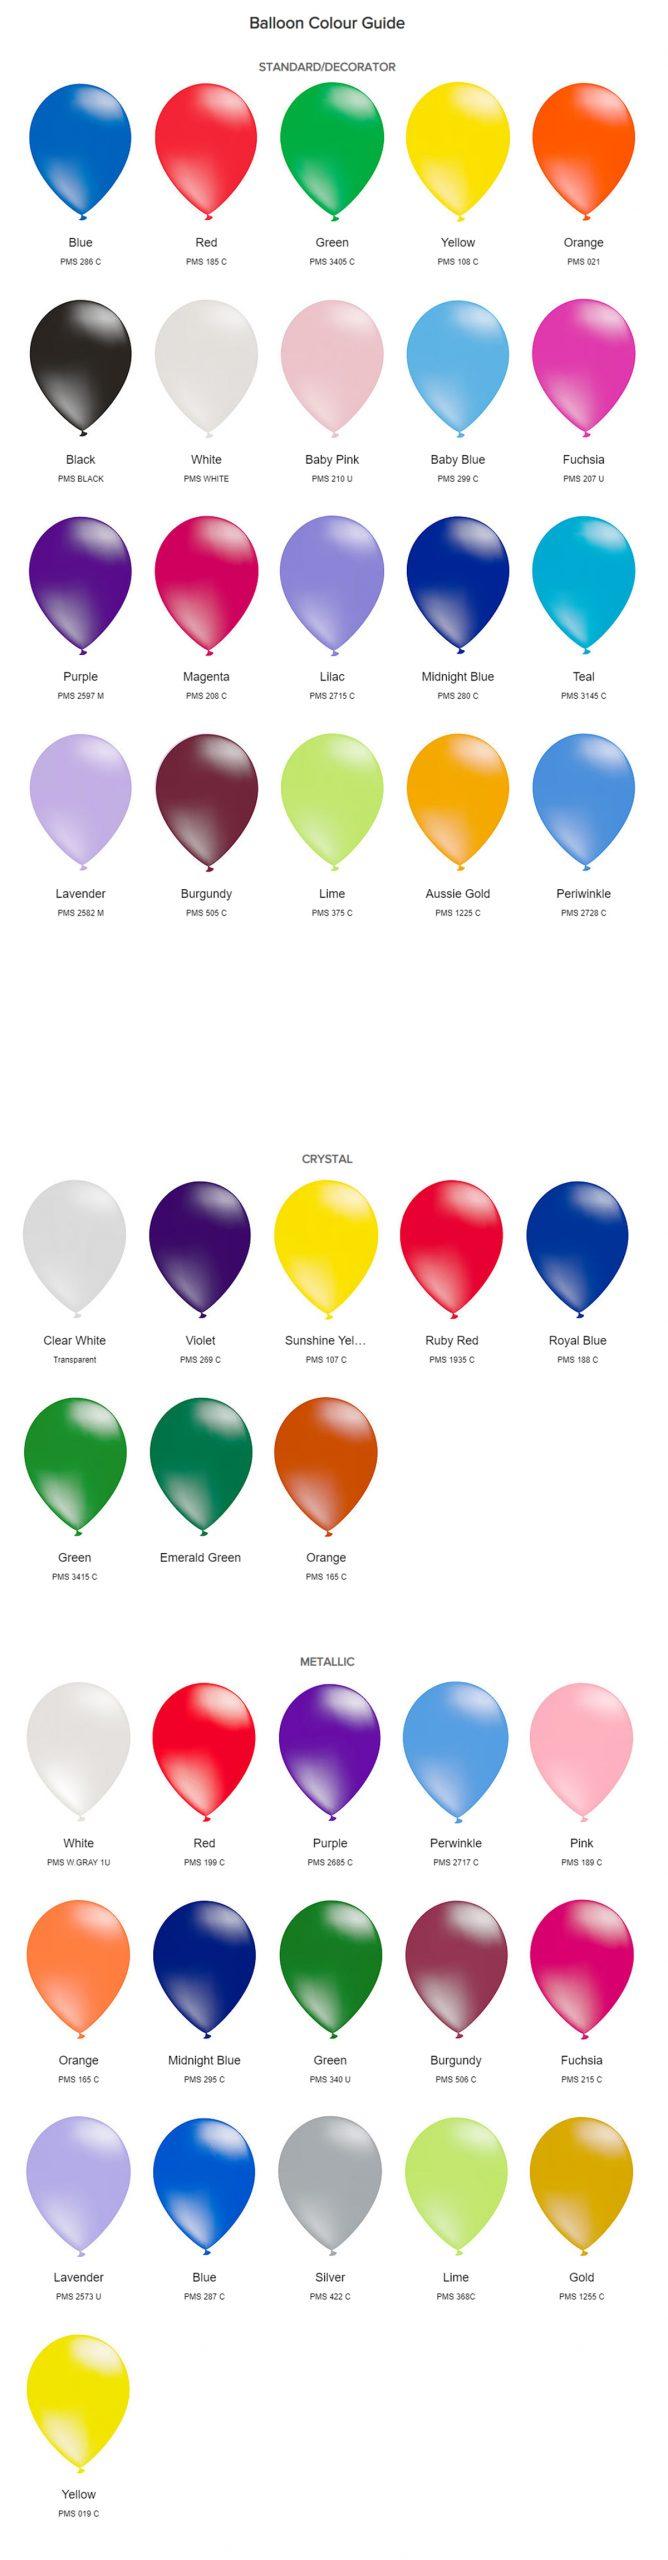 Printed Balloons Colour Chart